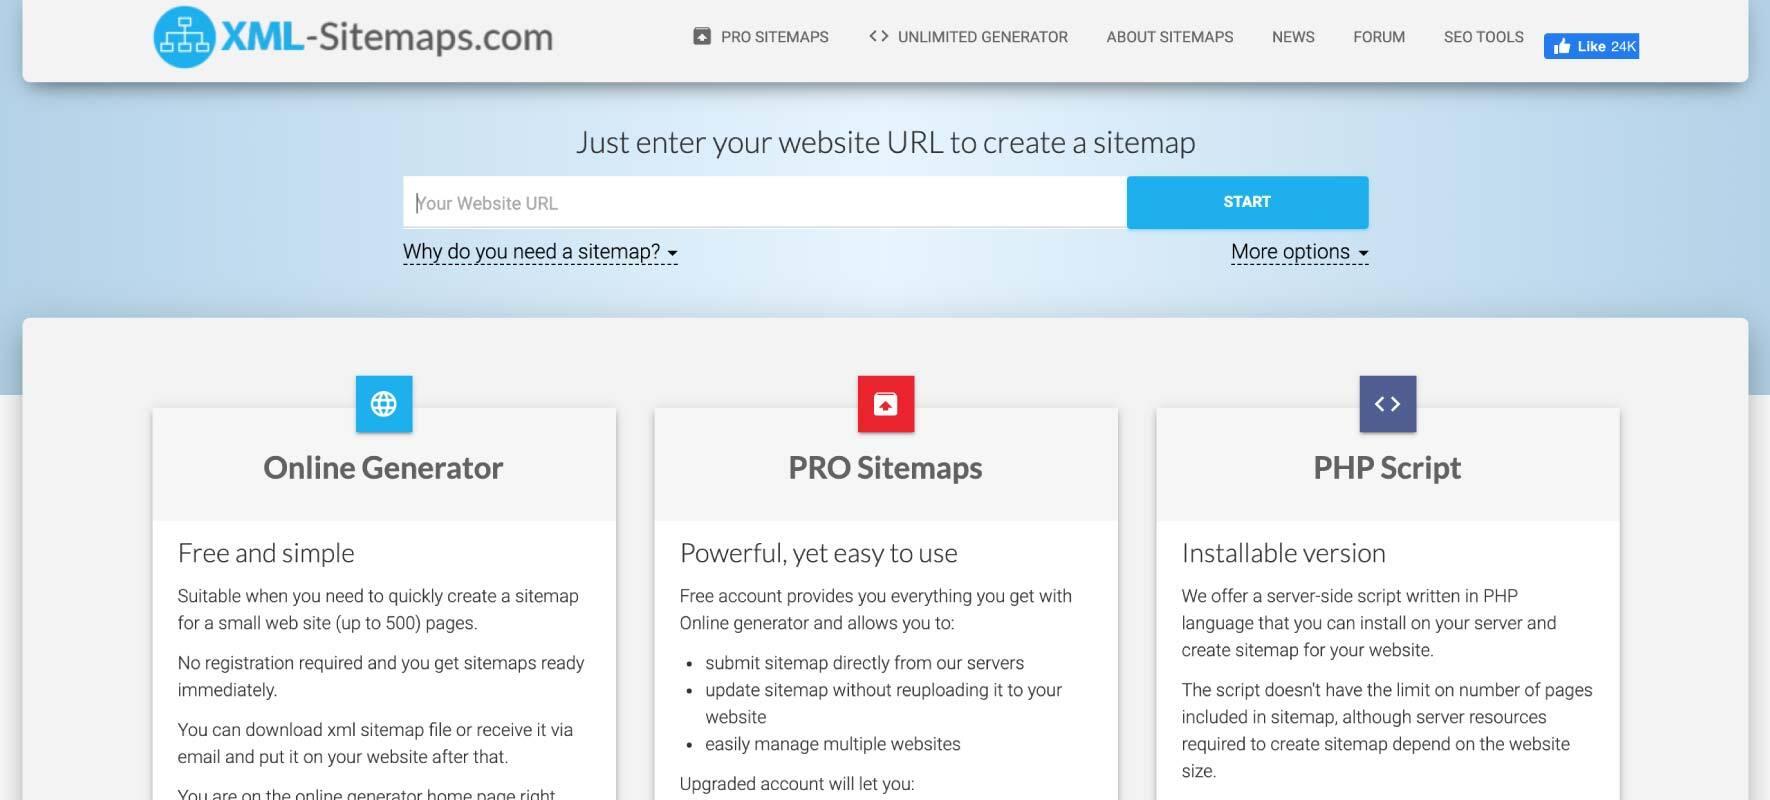 Best Sitemap Generator Tools XML-Sitemaps